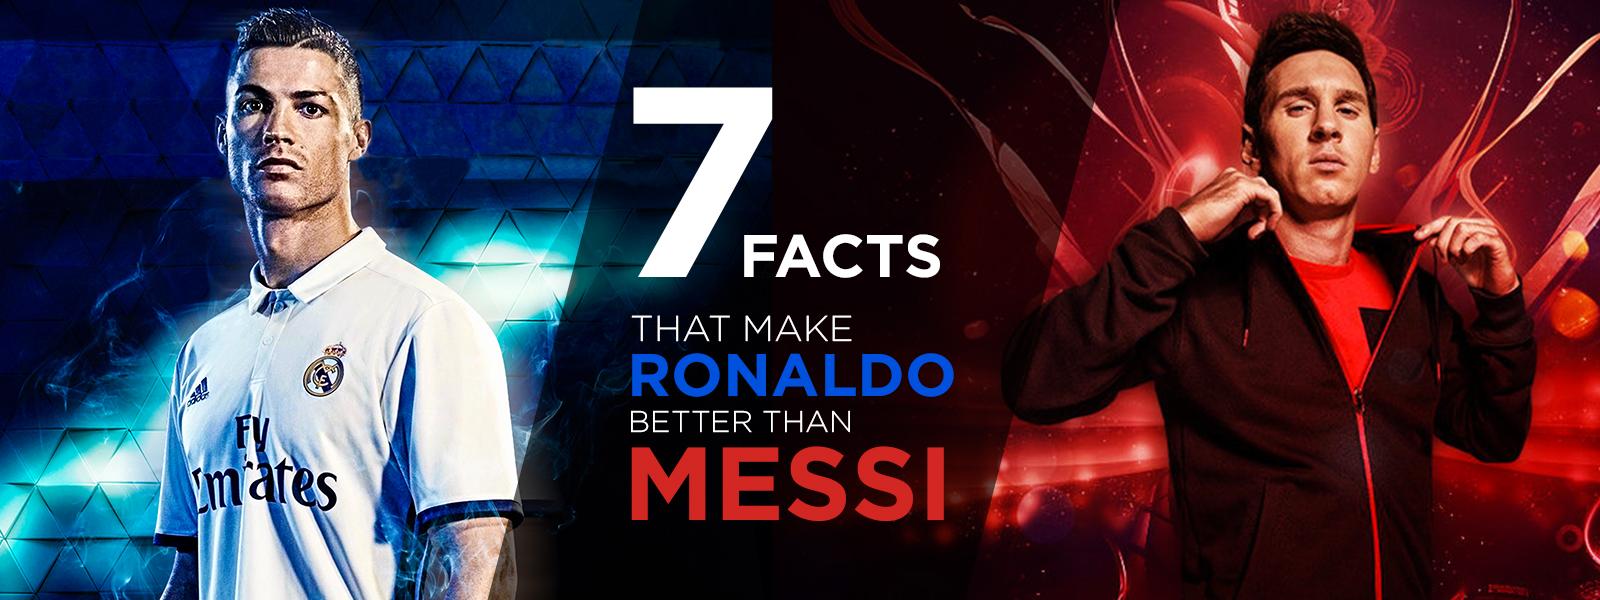 Seven Facts That Make Cristiano Ronaldo Better Than Lionel Messi